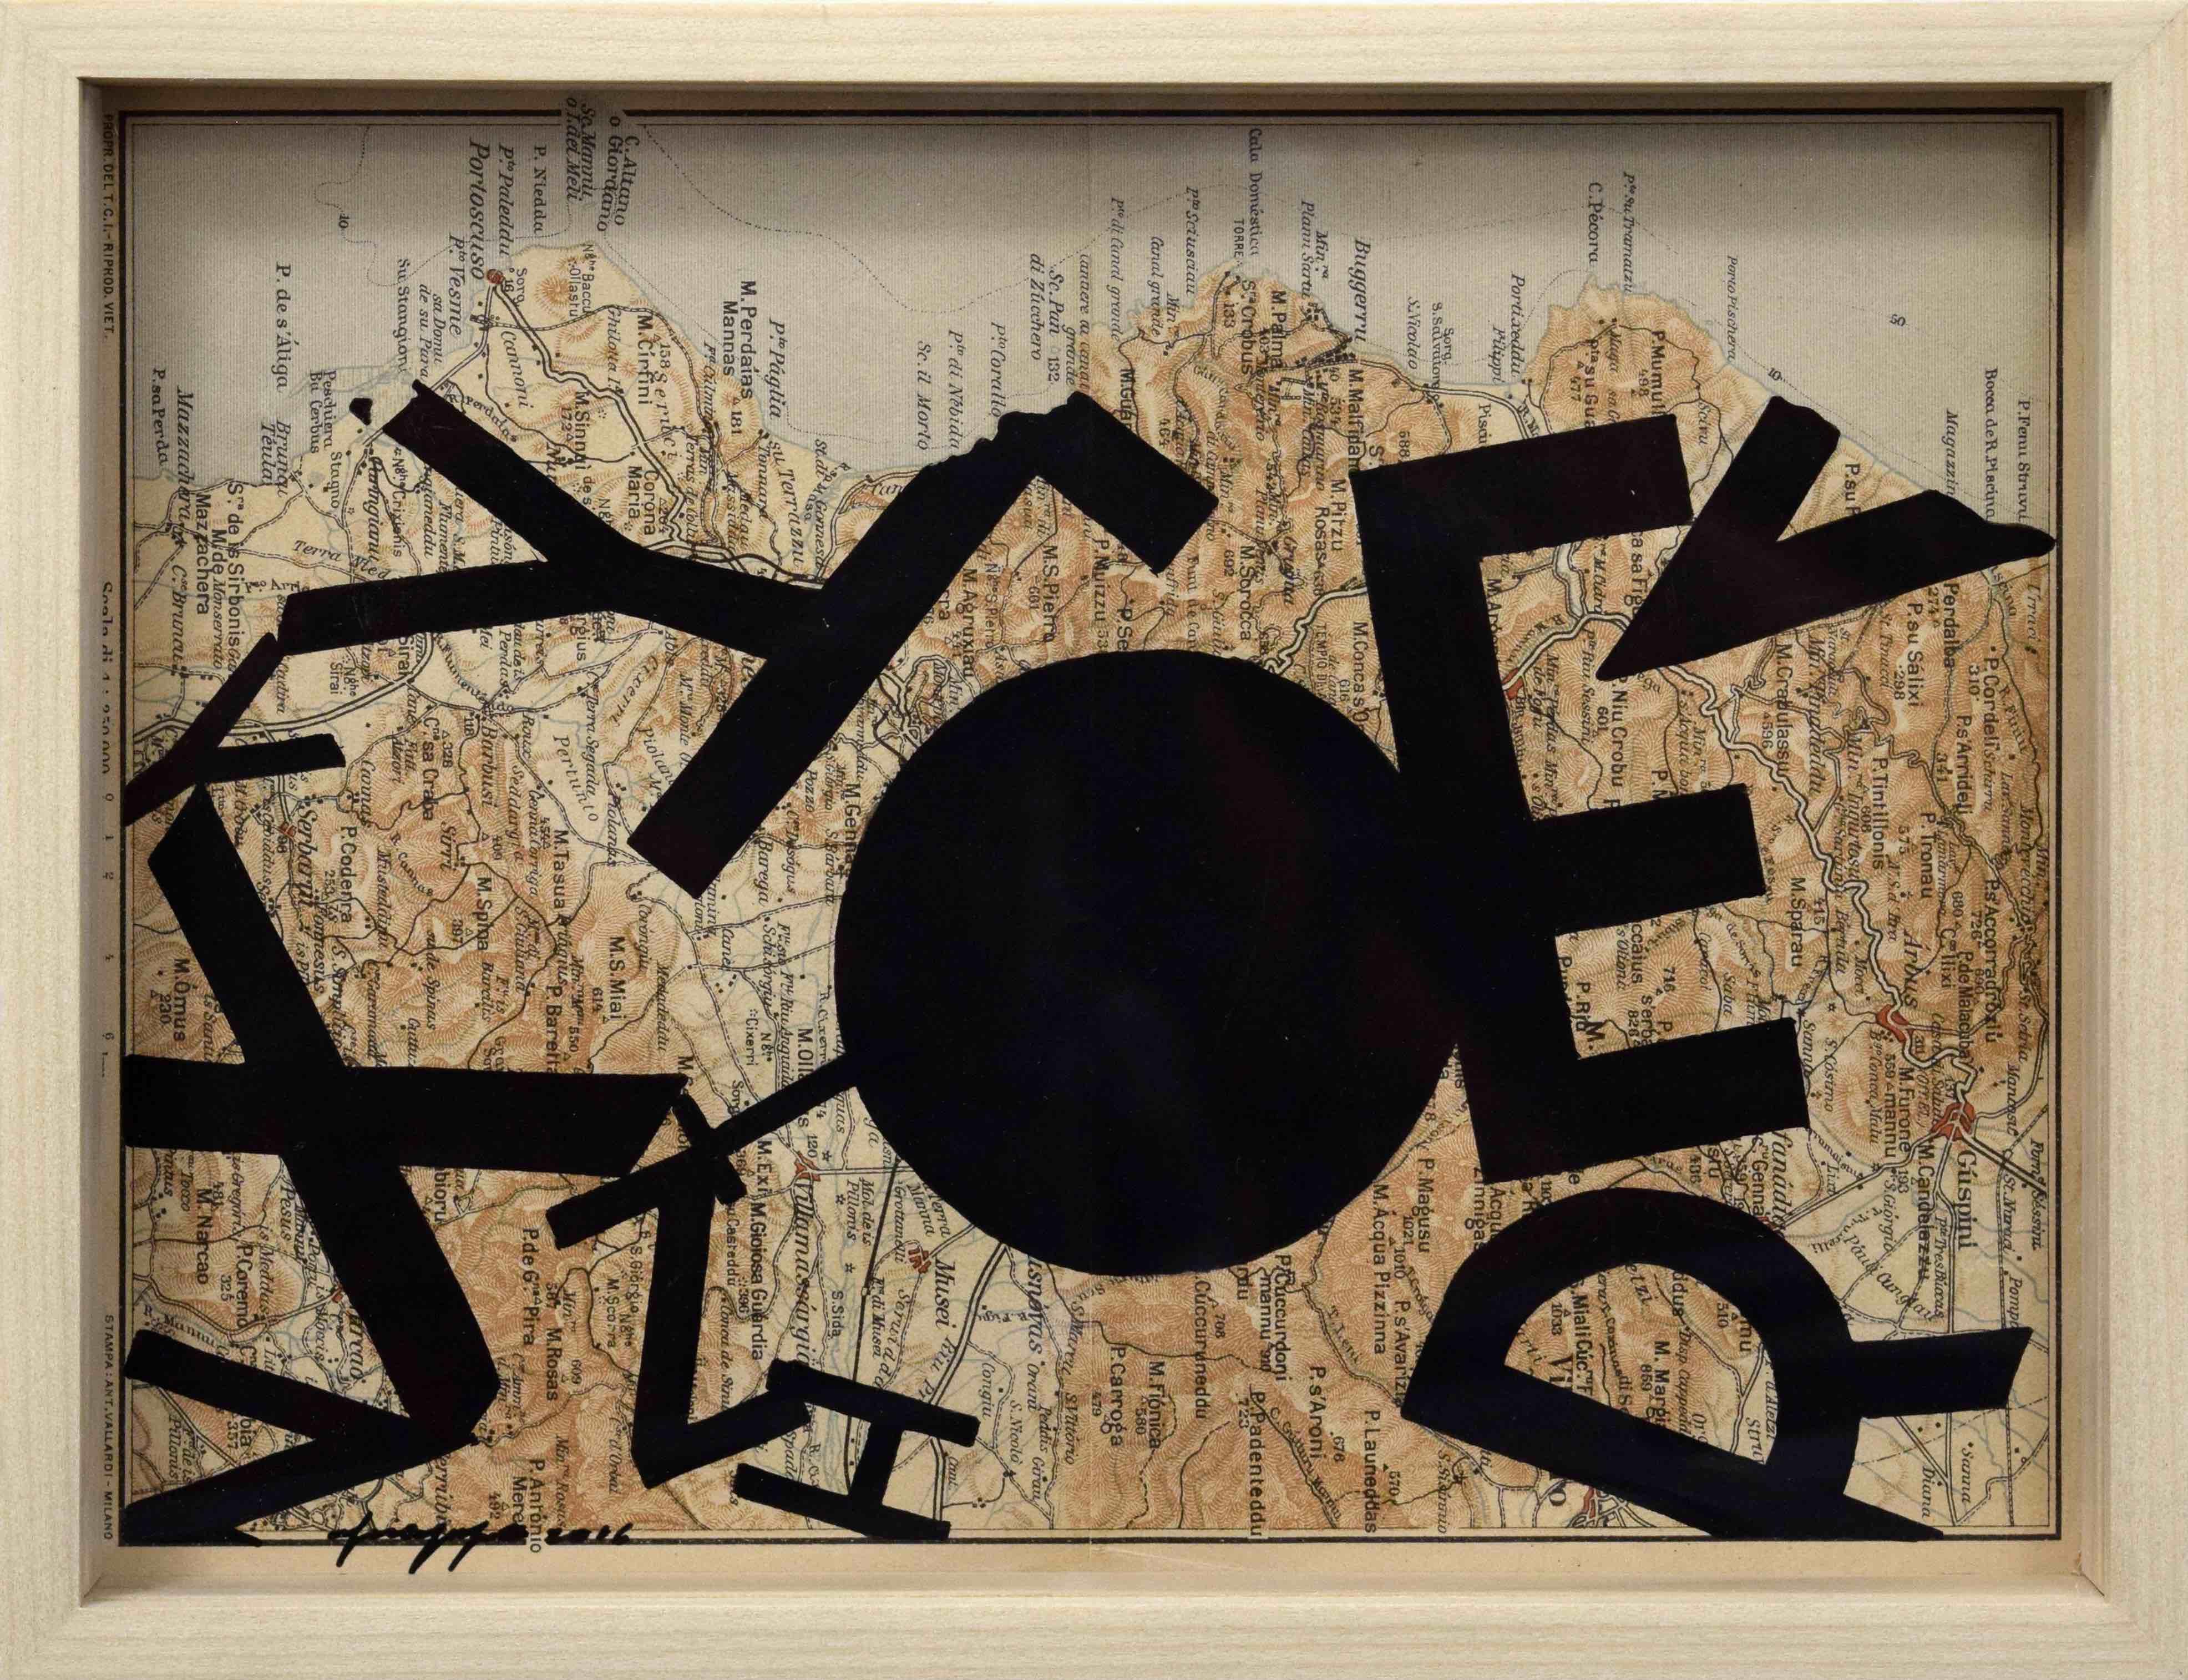 Opiemme, Iglesias, 2016, acrilico su cartina d'epoca, cm 20,5x15,5